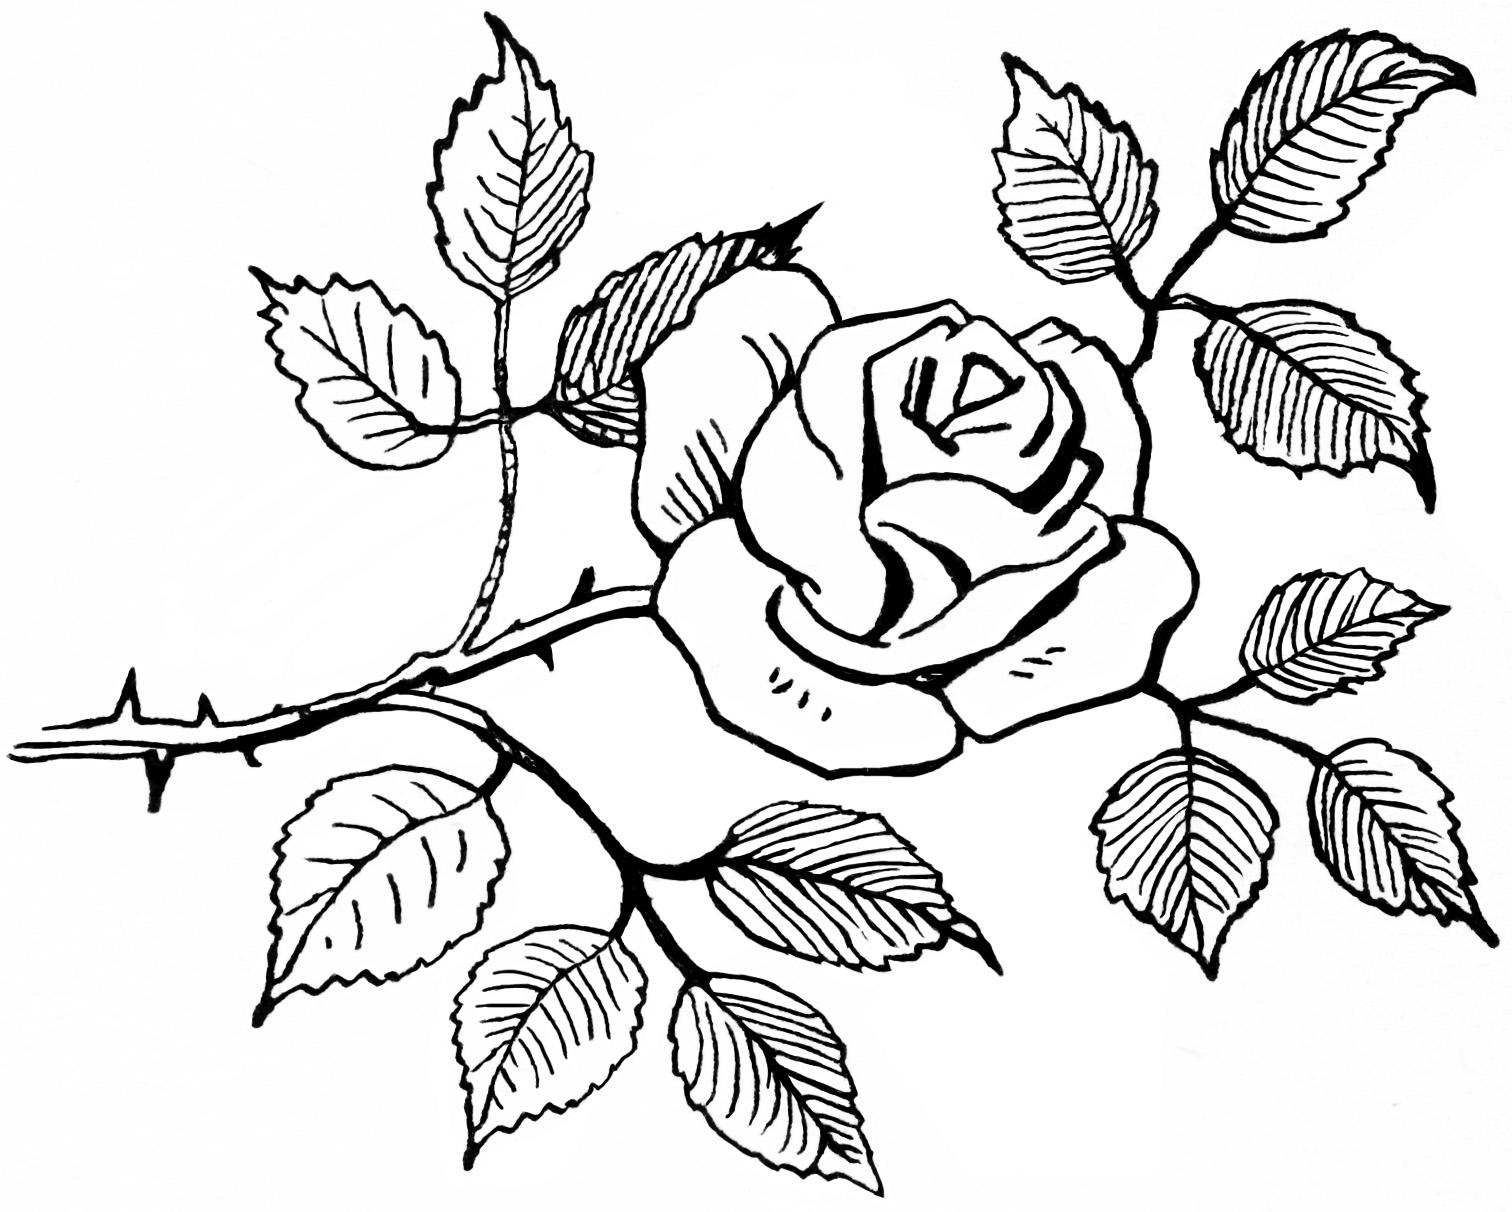 Rose sketch clipart.